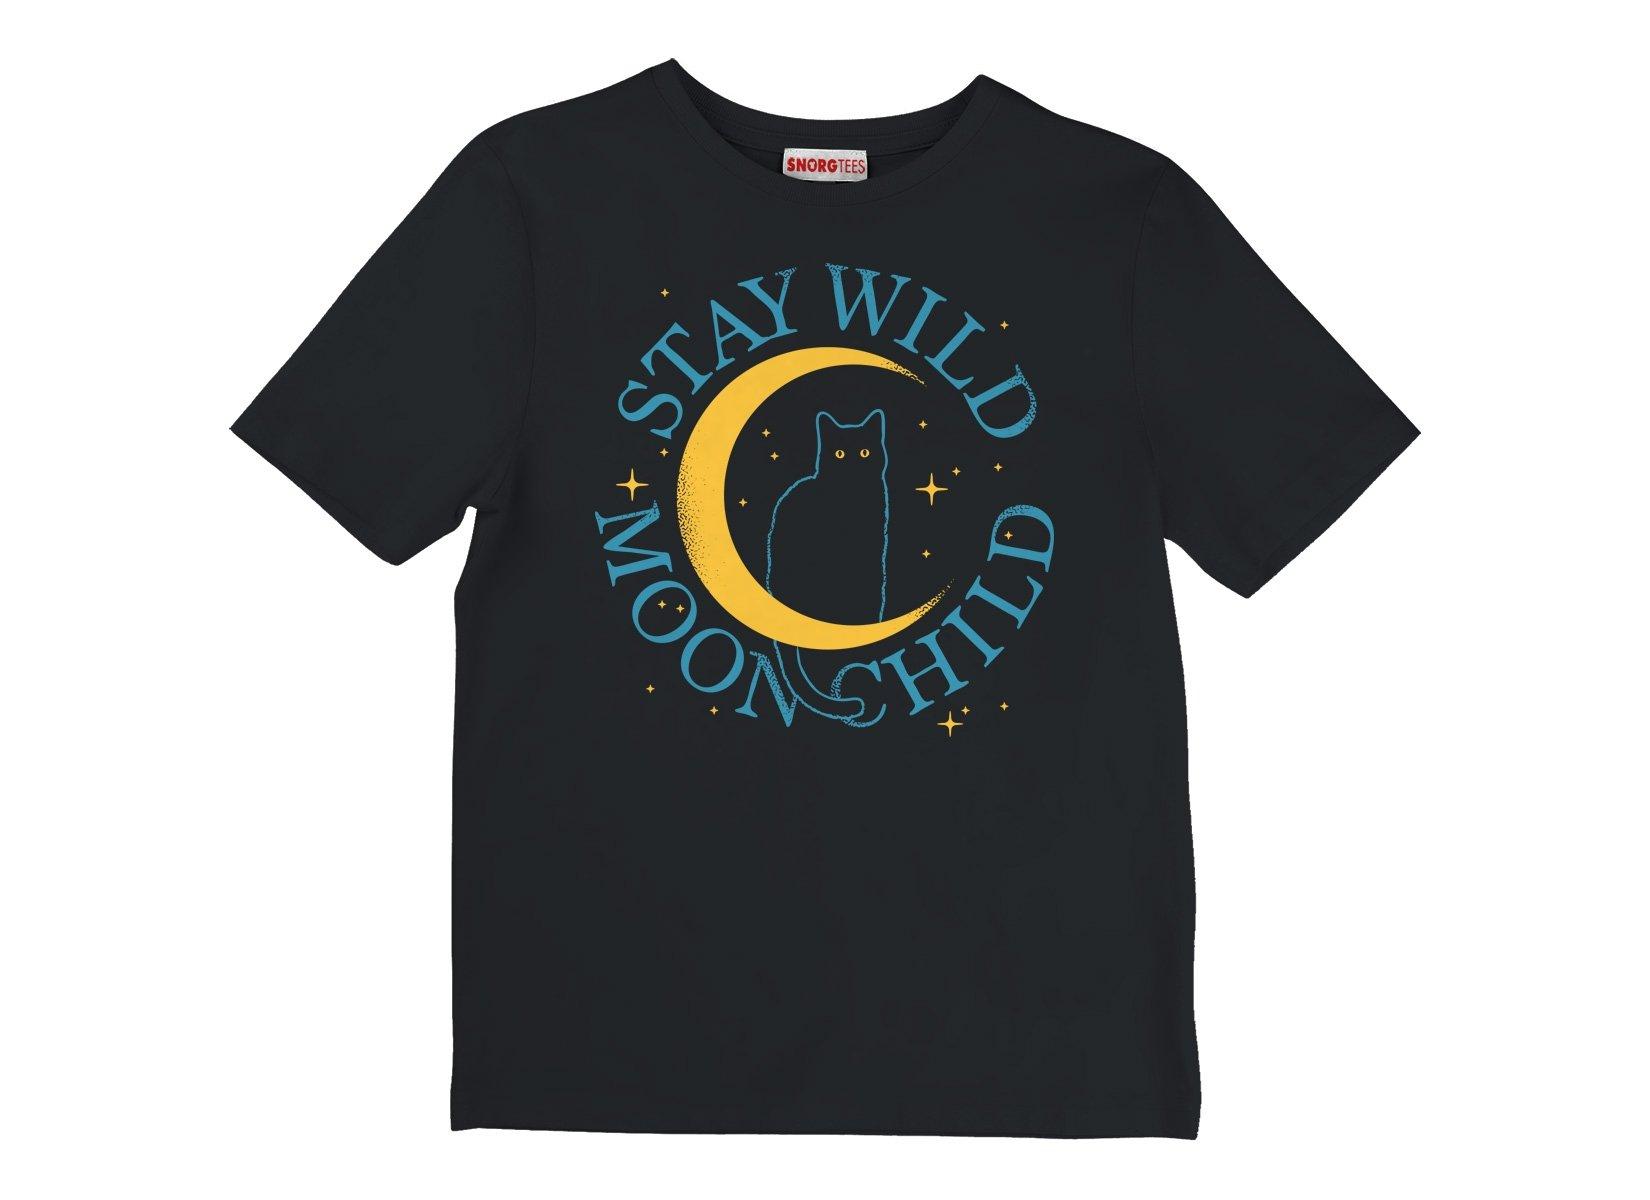 Stay Wild Moon Child on Kids T-Shirt